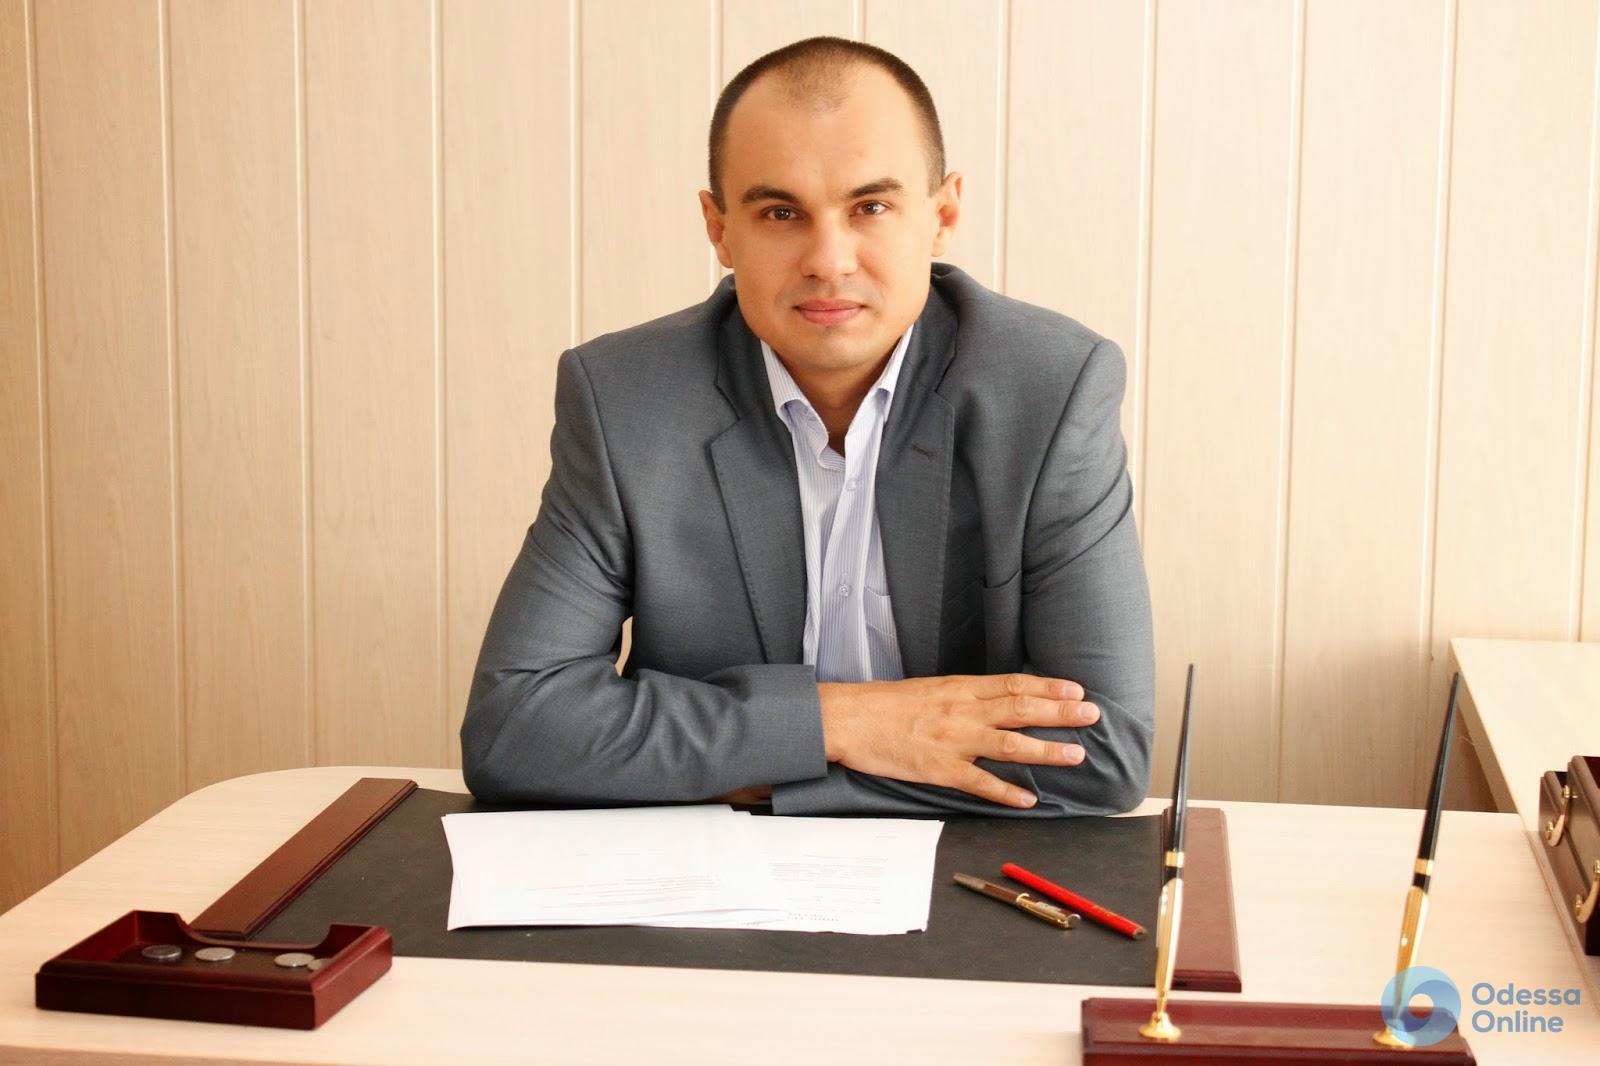 И. о. ректора Одесского медуниверситета не пускают на рабочее место (видео)